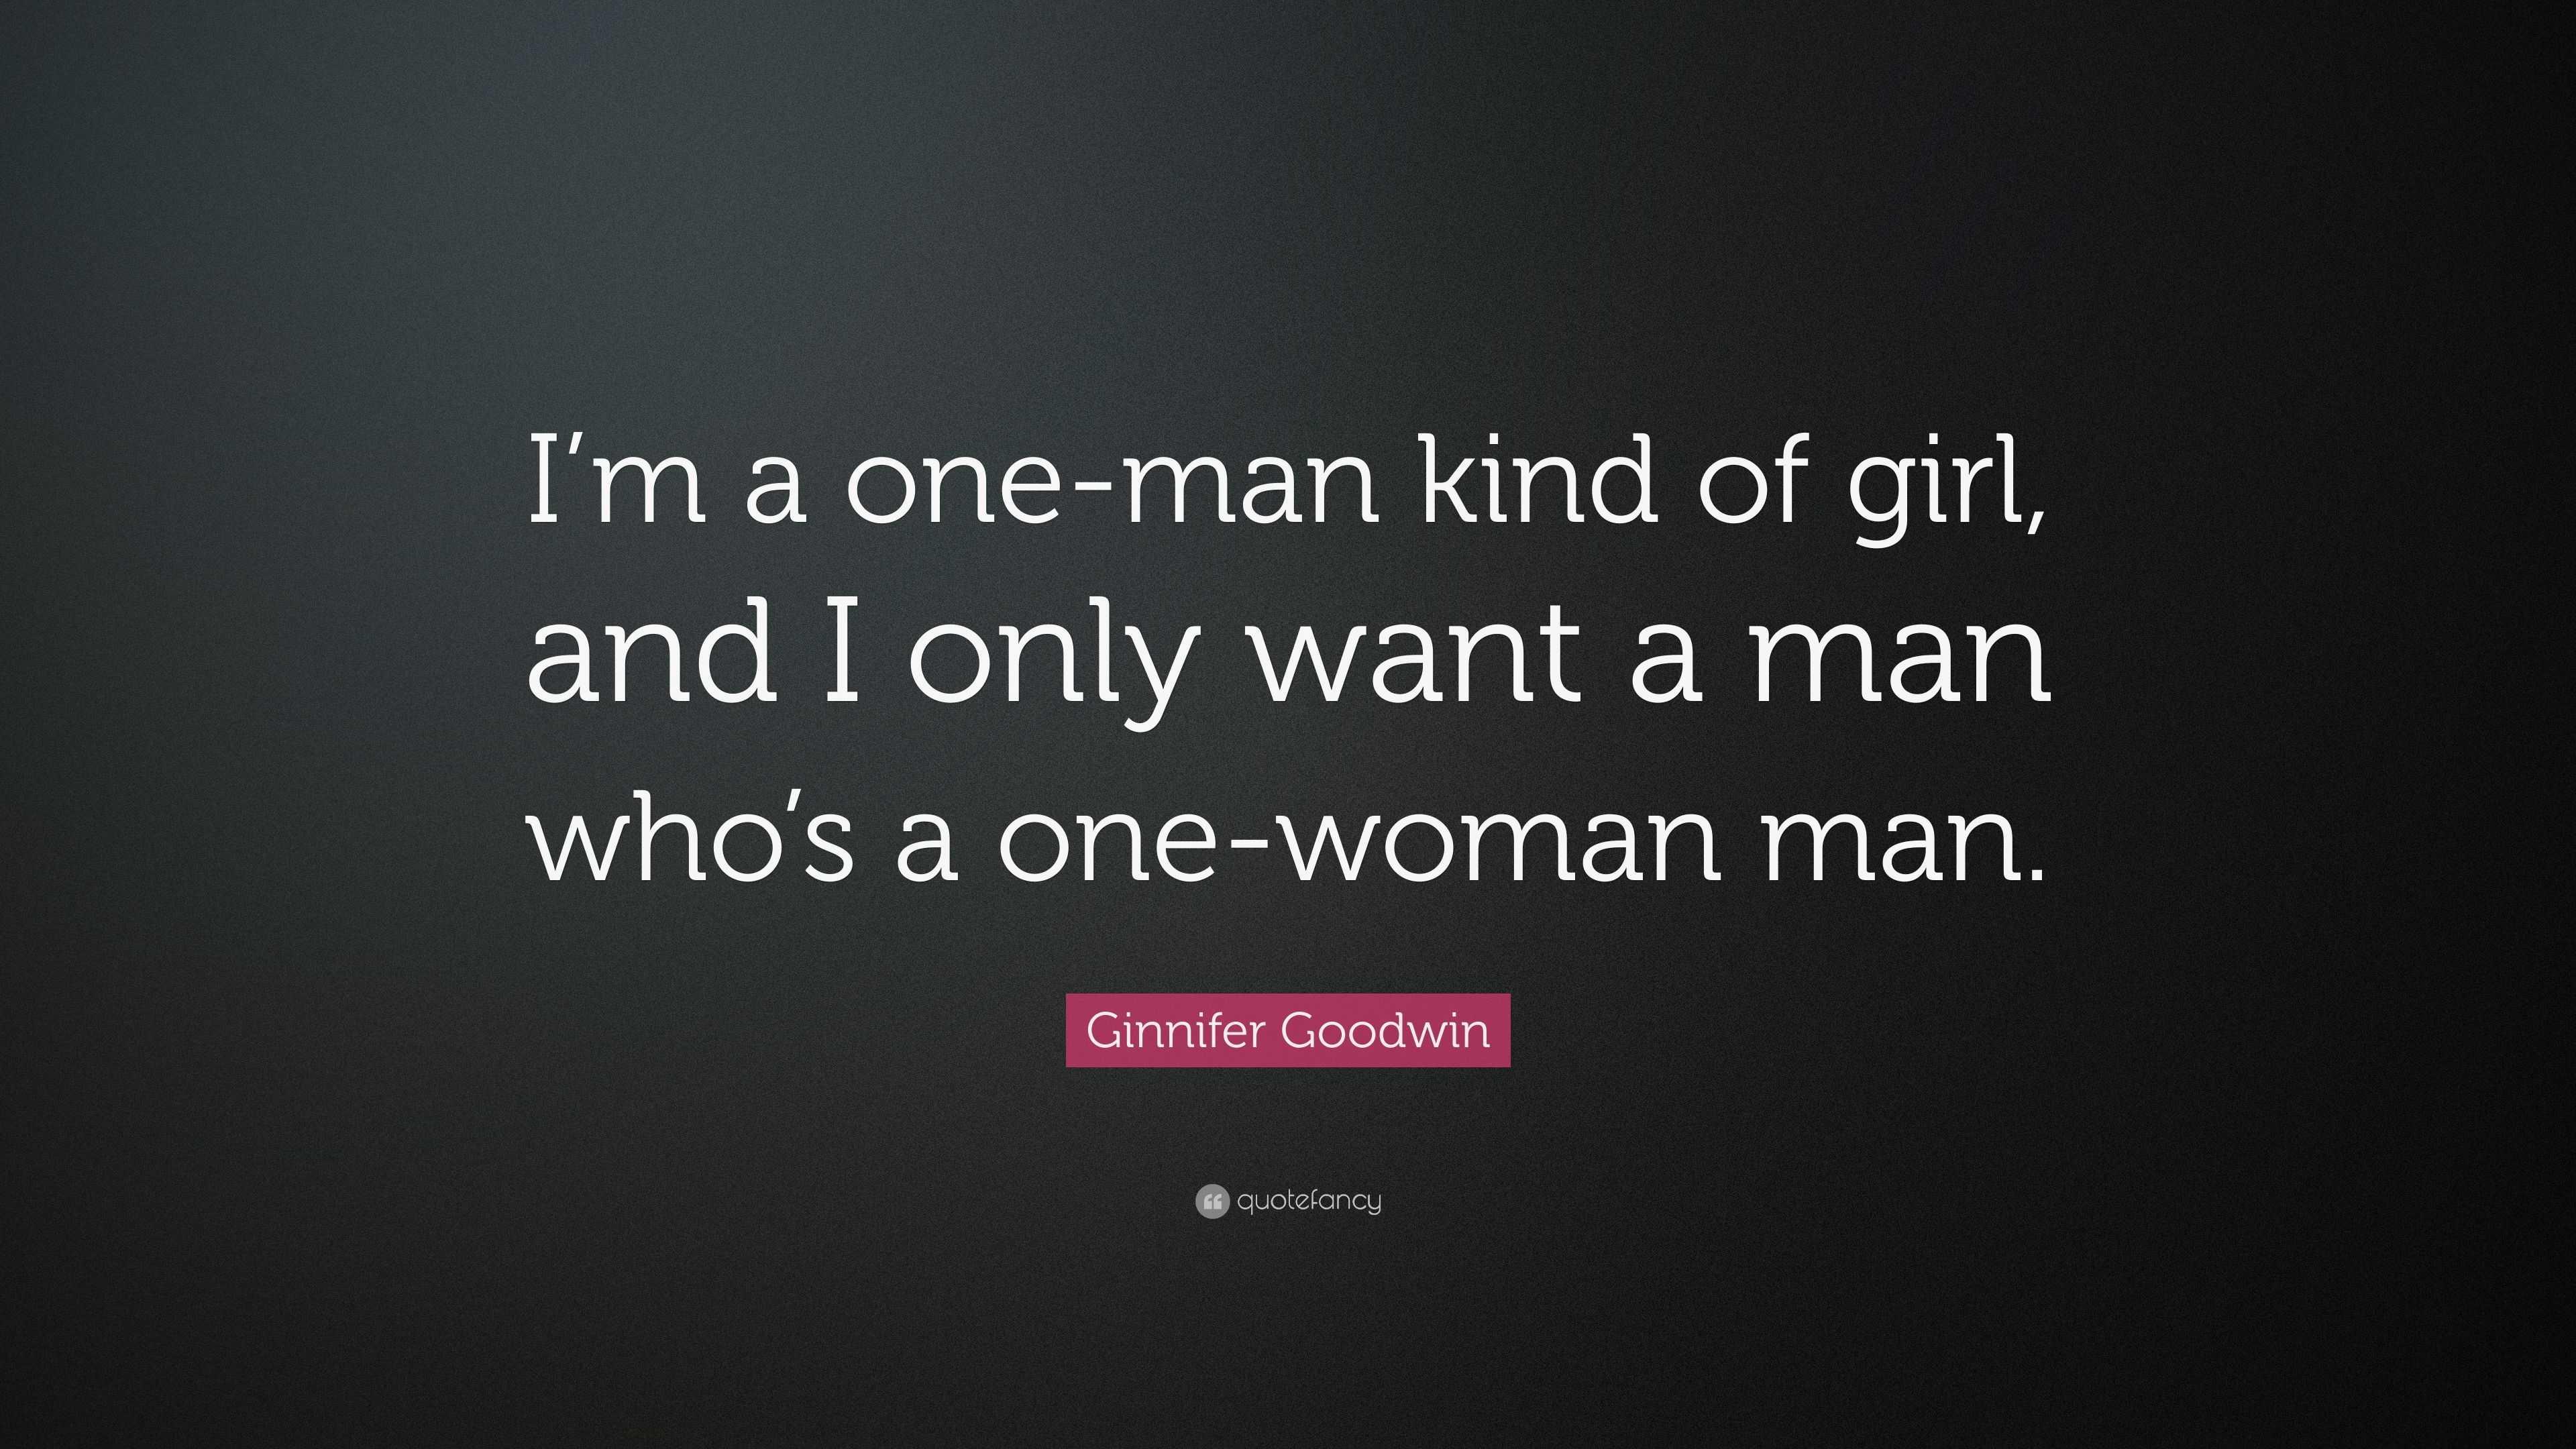 Single mann kind